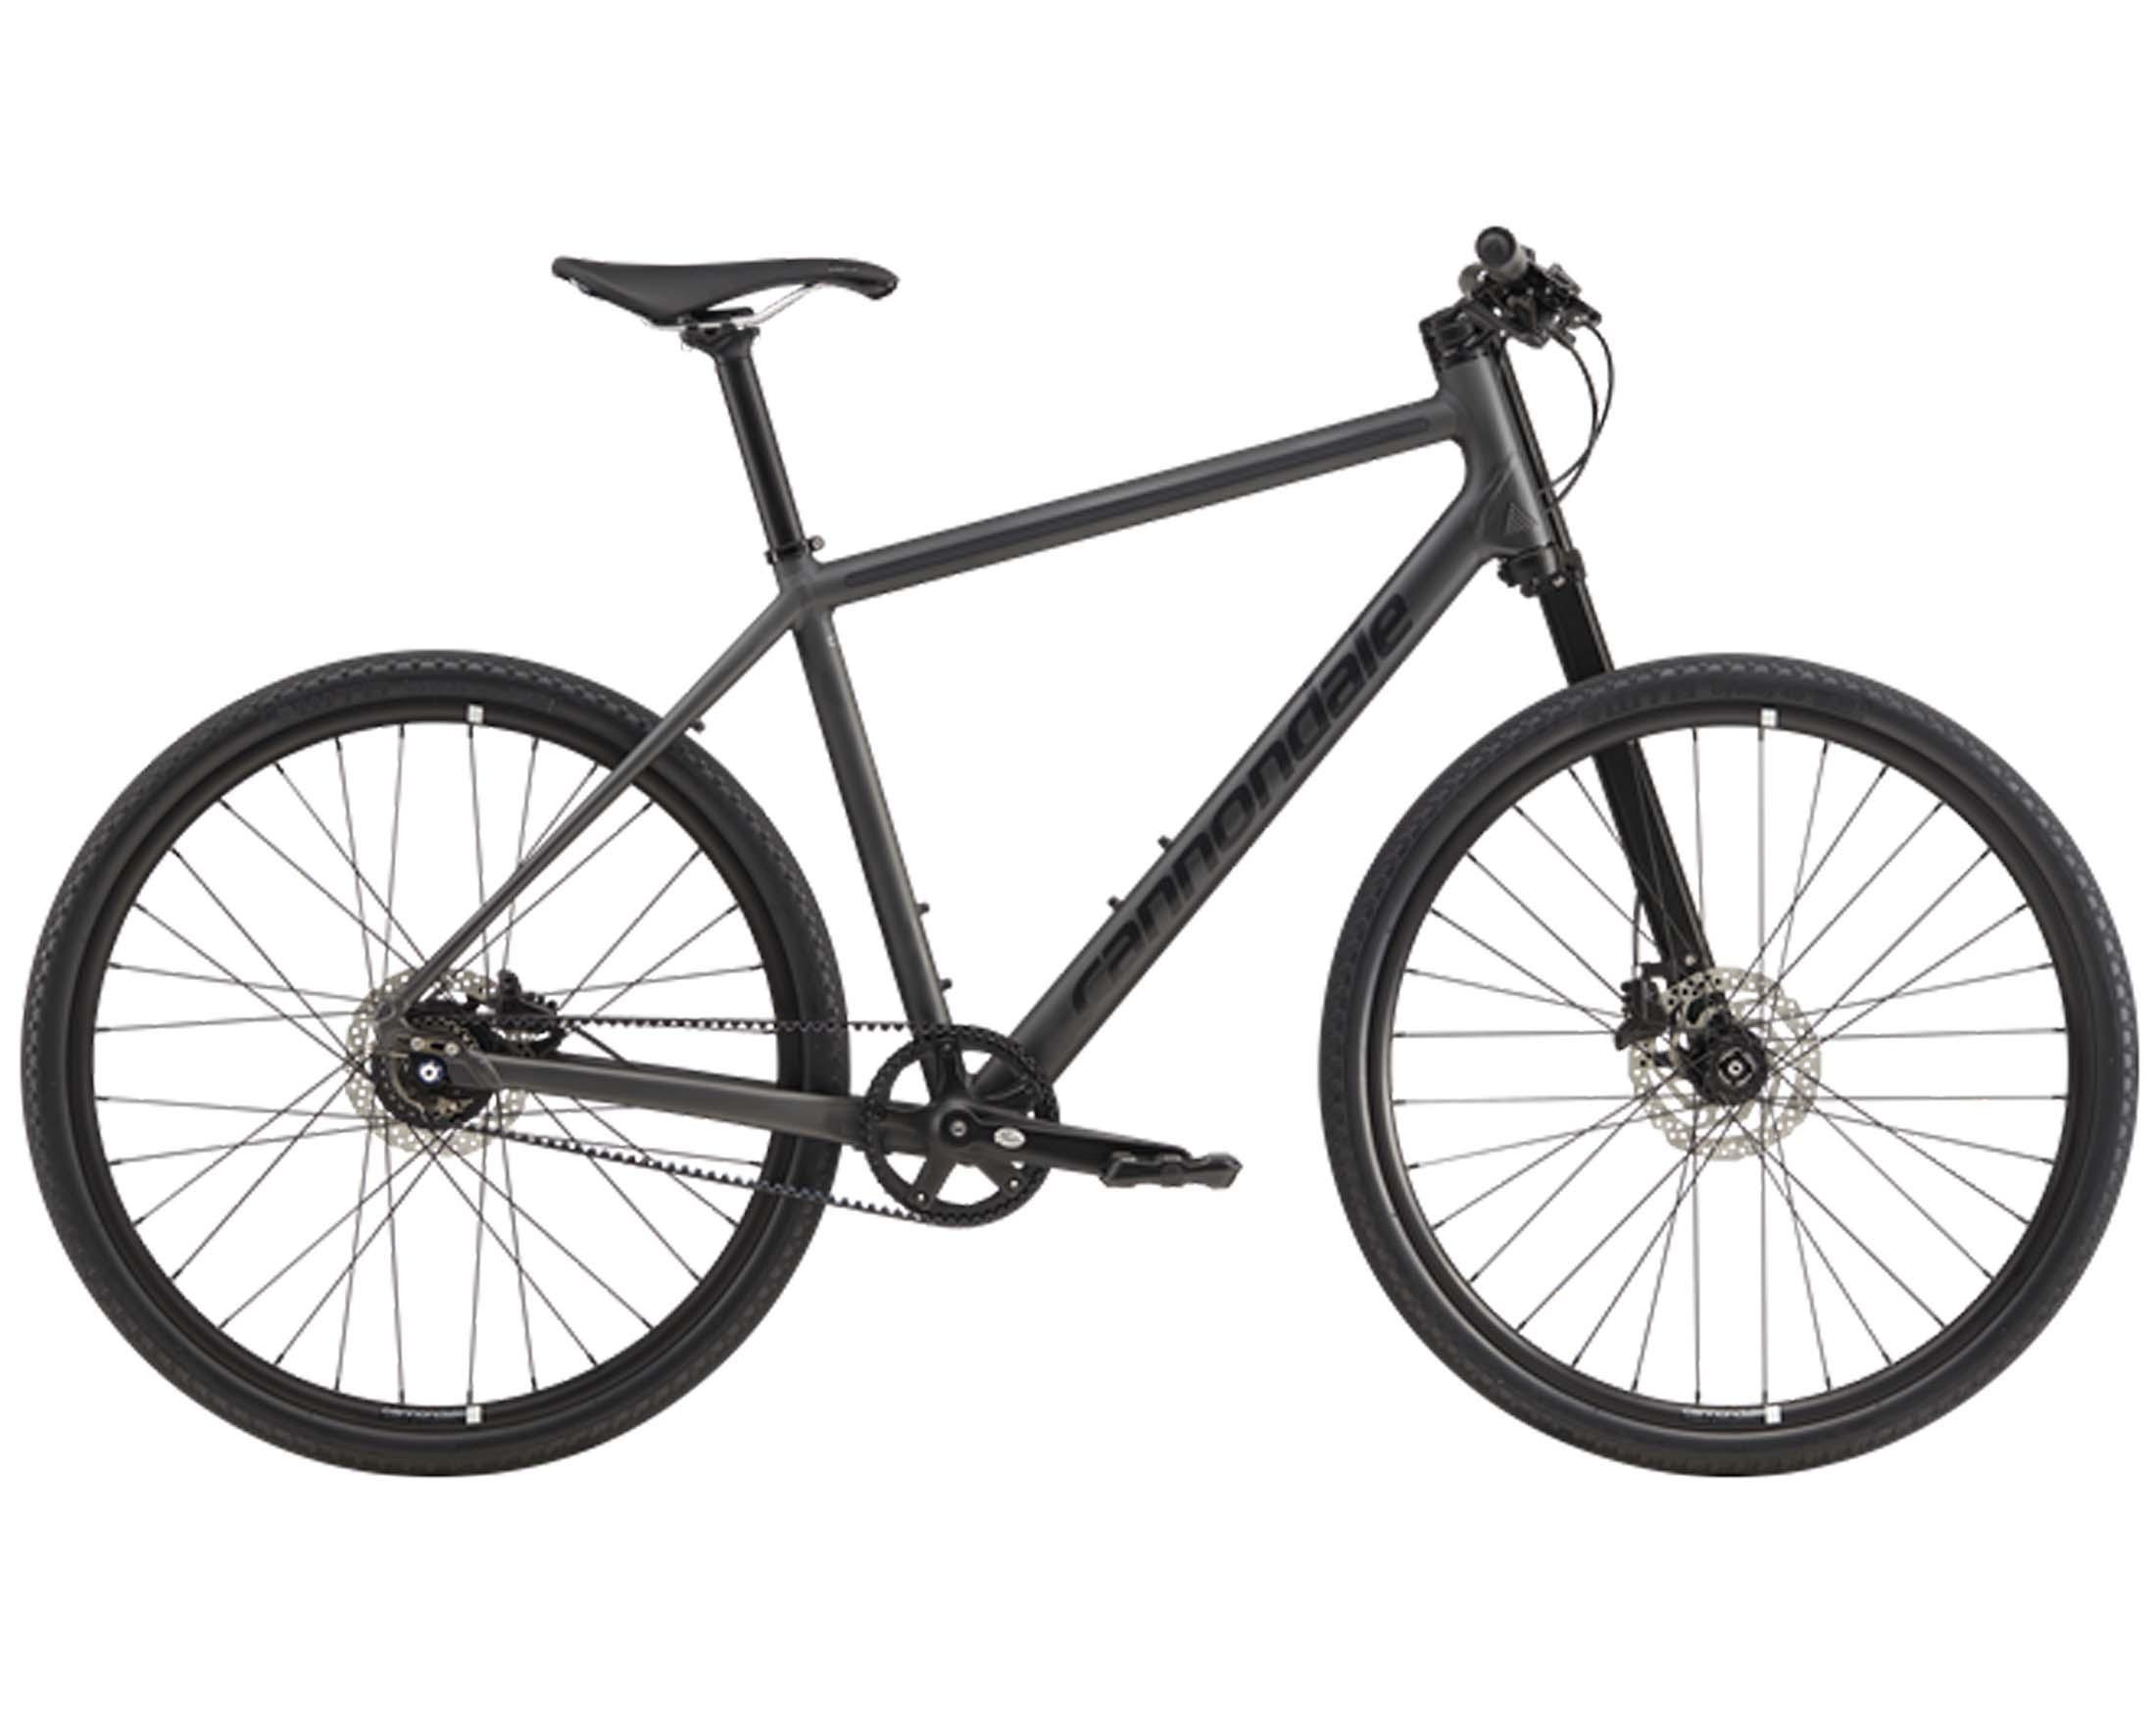 cannondale urban bike urban fahrrad f r die stadt. Black Bedroom Furniture Sets. Home Design Ideas